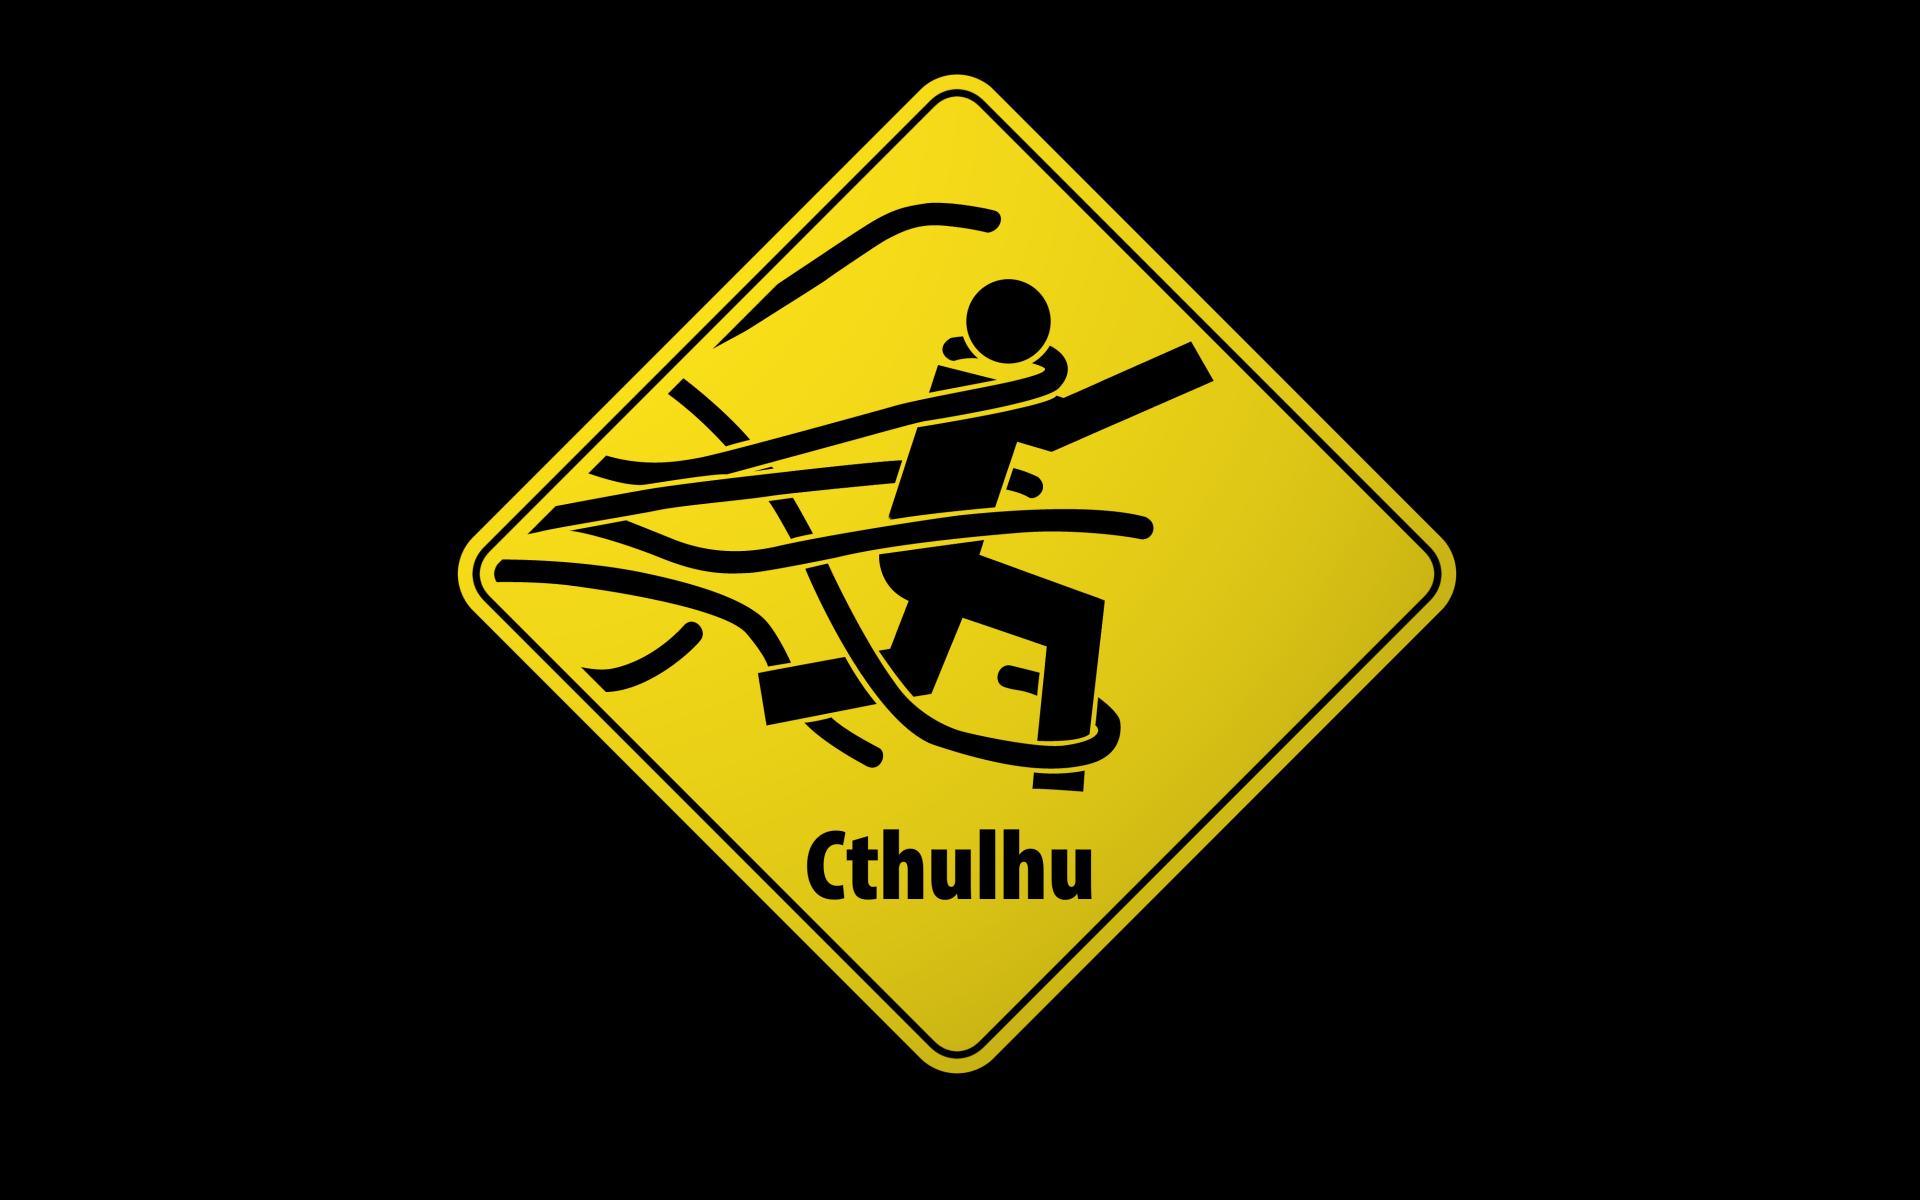 Fondos De Pantalla Wallpapers Gratis Cuidado Cthulhu